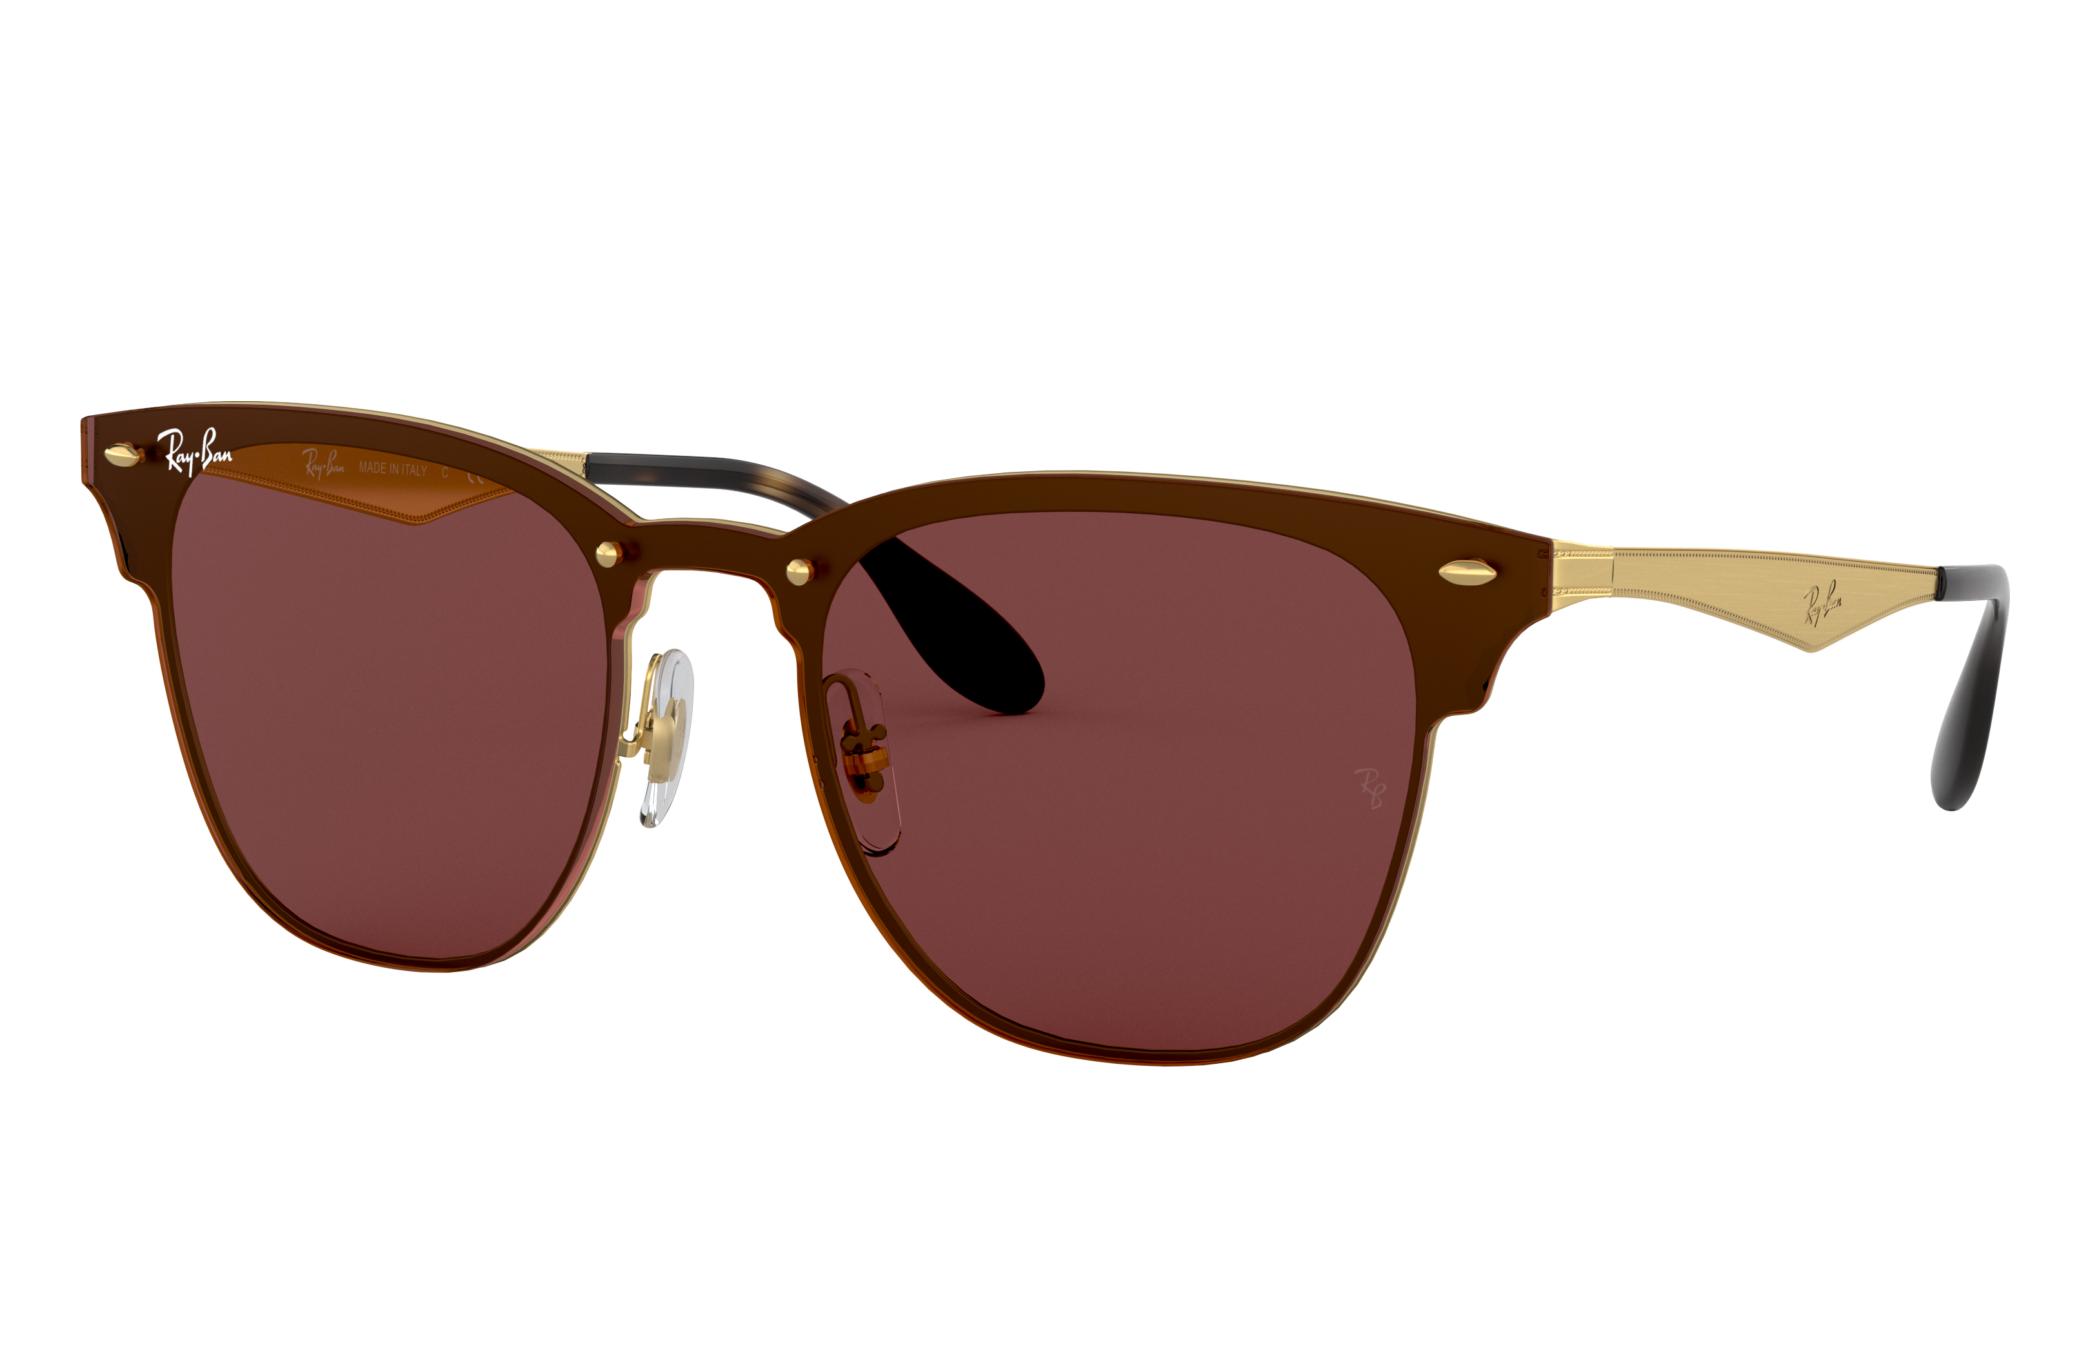 Ray-Ban Blaze Clubmaster Gold, Violet Lenses - RB3576N